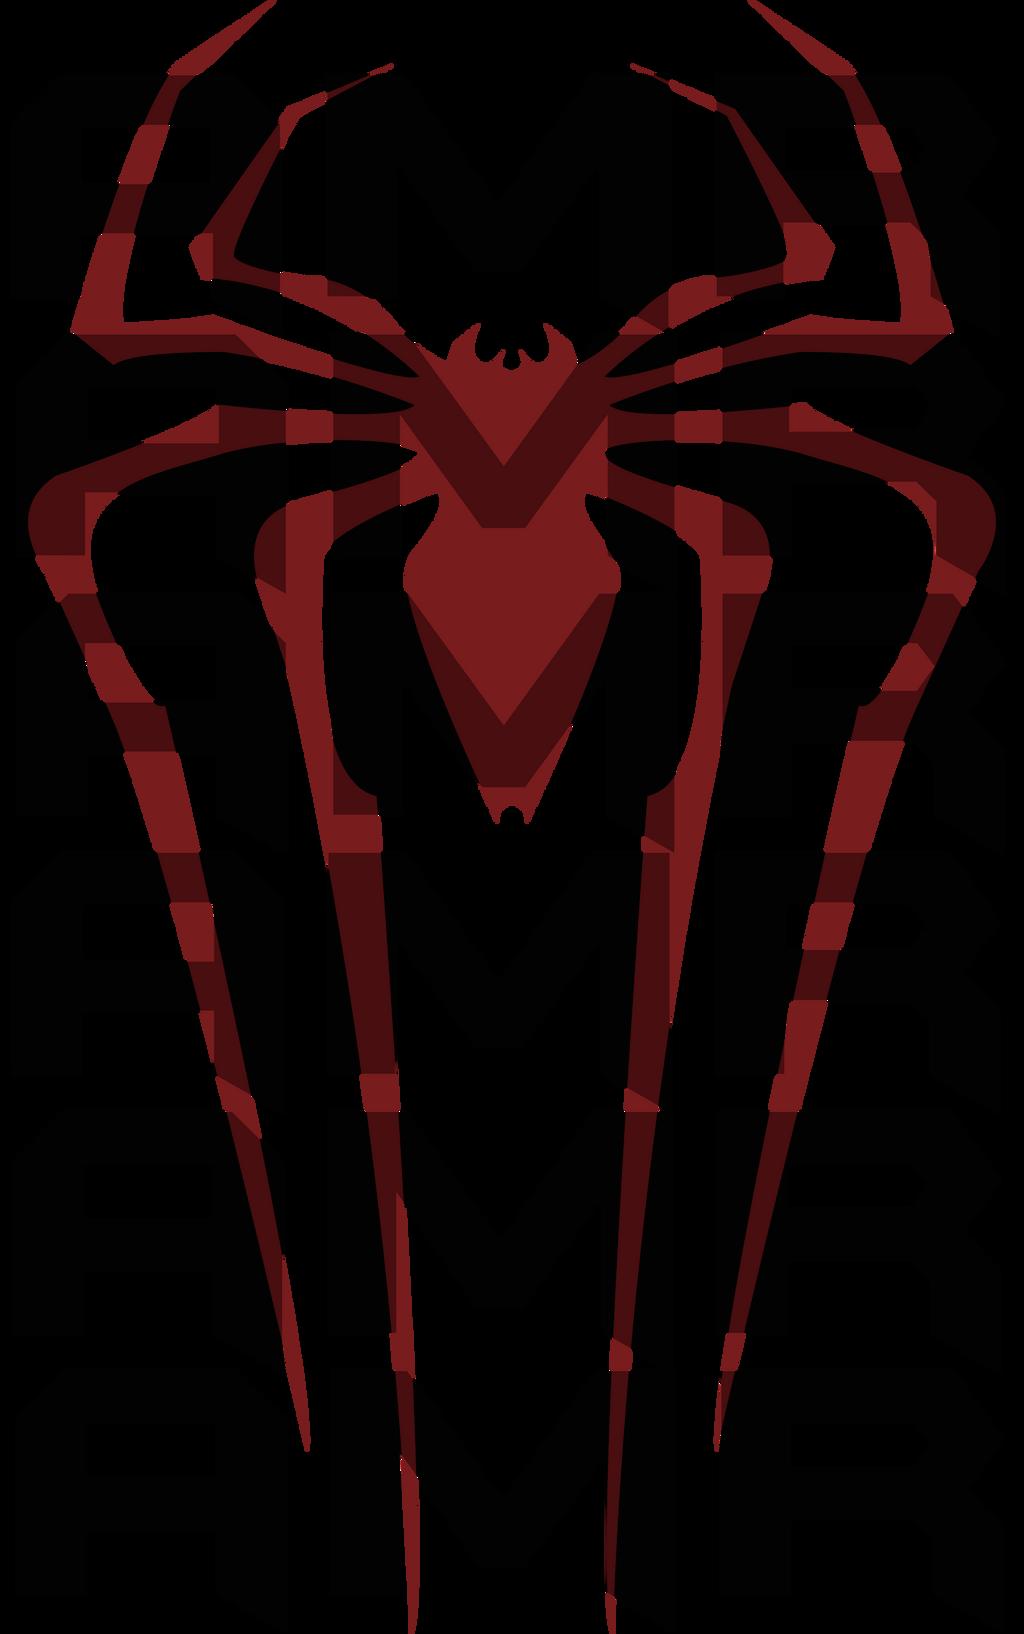 Spiderman back spider logo - photo#20